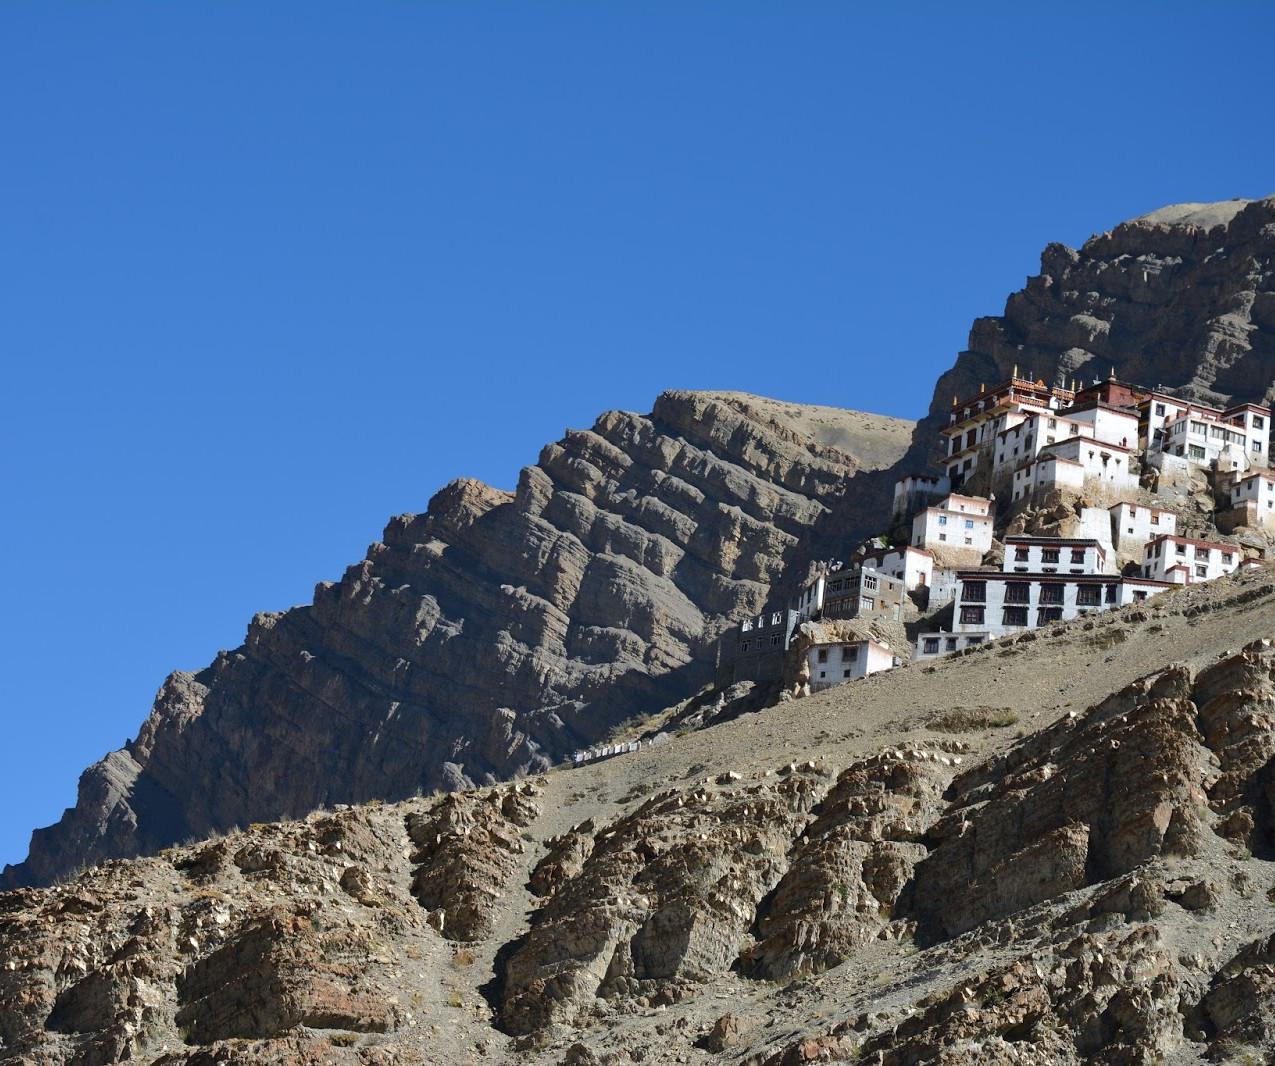 Ladakh-Spiti-2016-DSC_5977